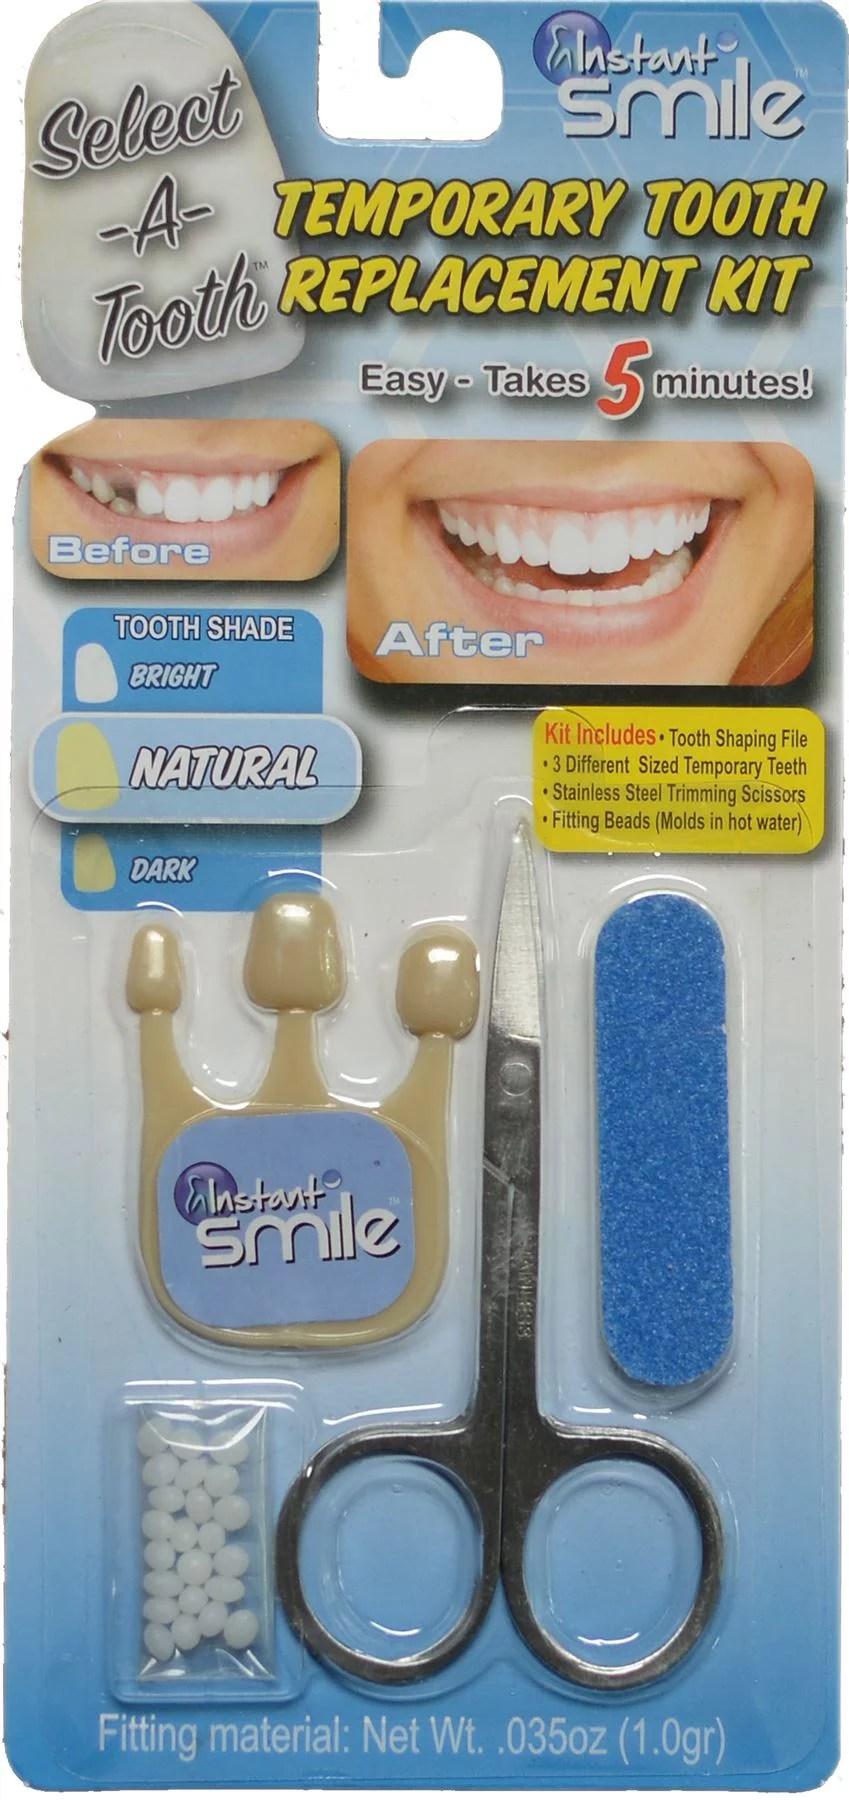 Tooth Repair Kit Walmart : tooth, repair, walmart, Instant, Smile, Select, Tooth, Temporary, Replacement, Natural, Walmart.com